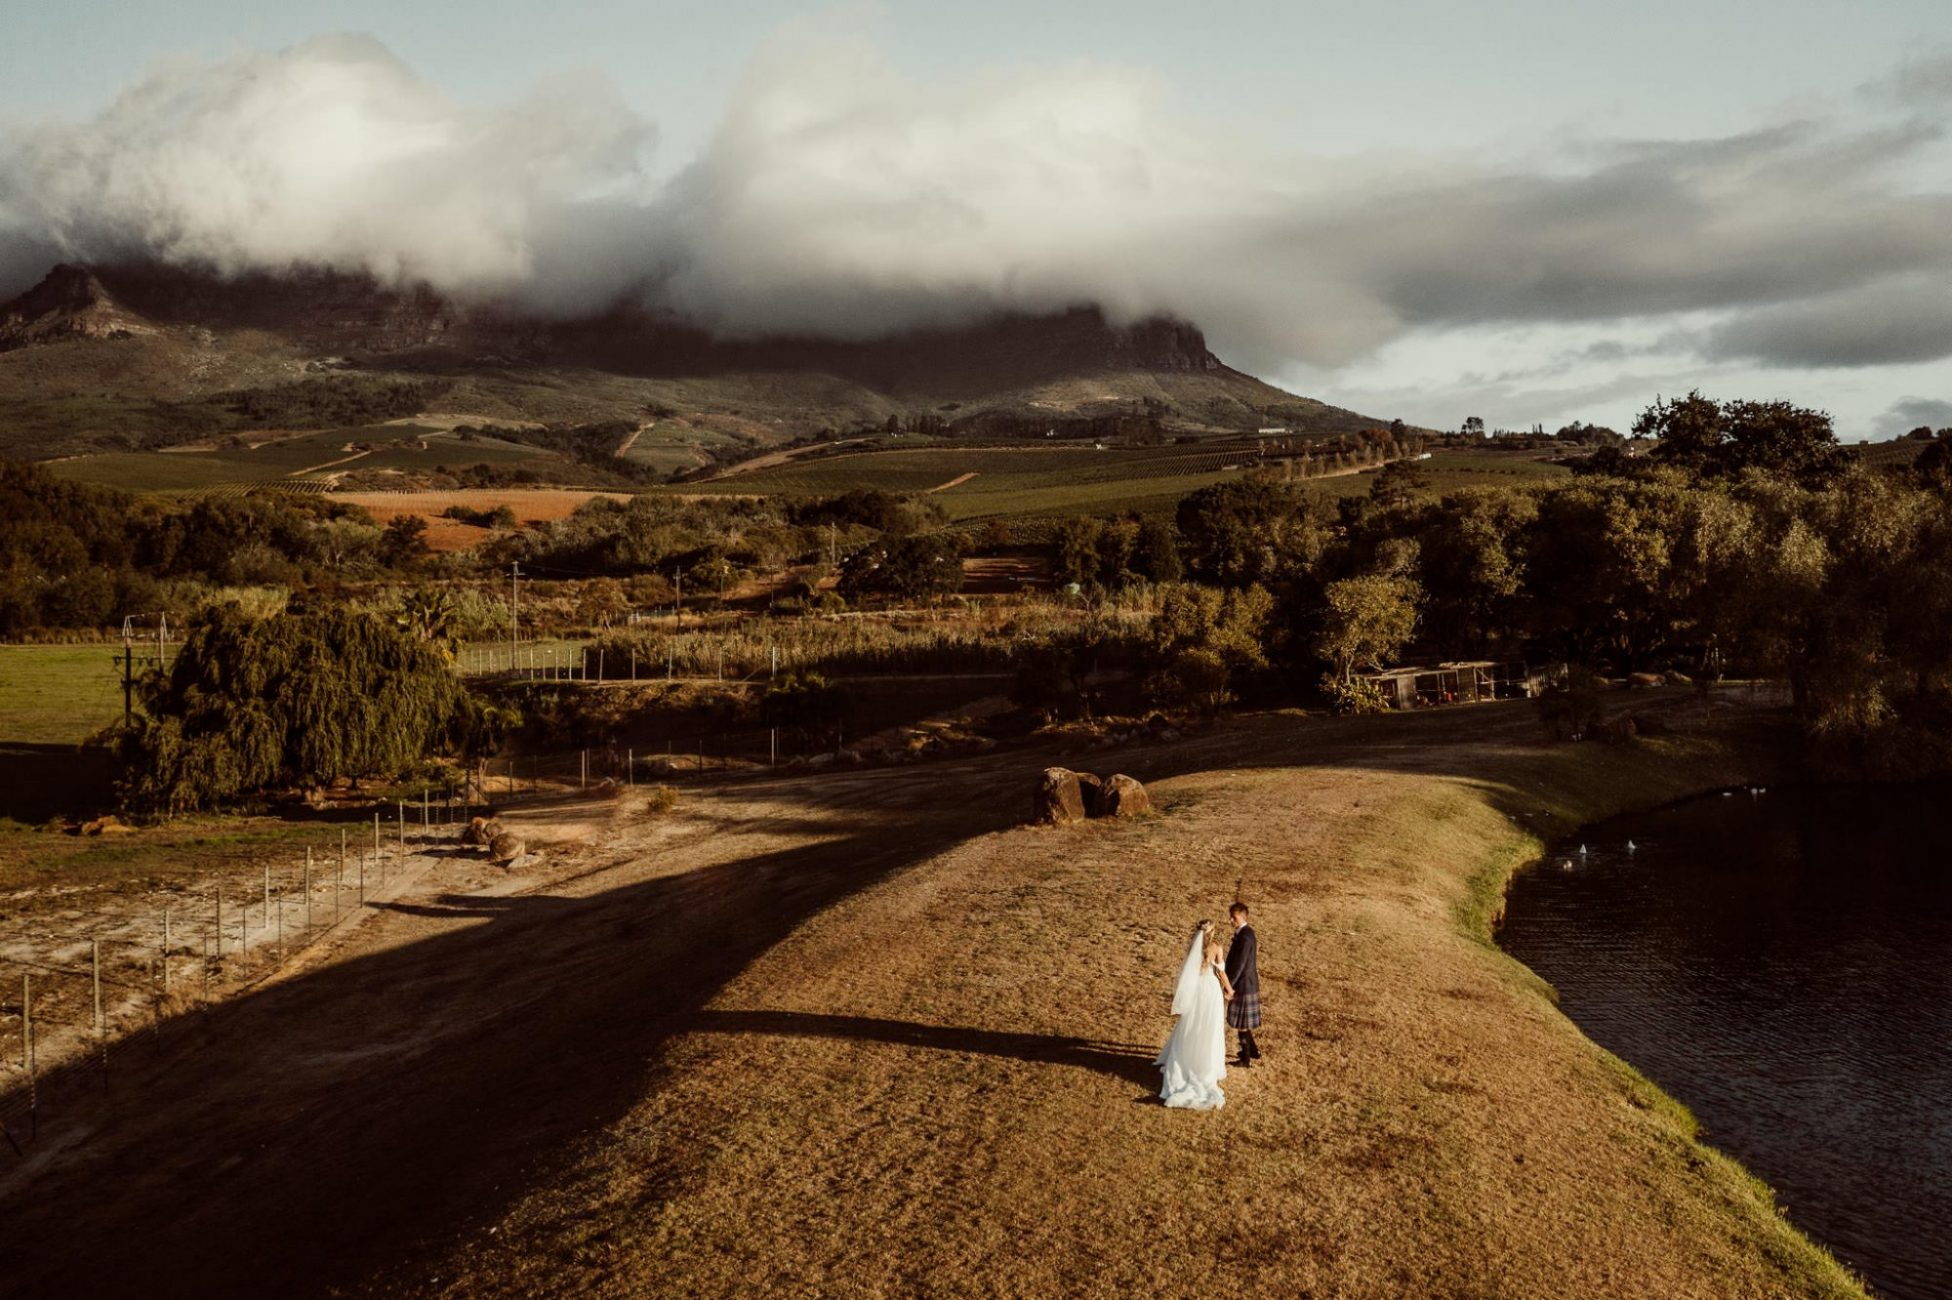 webersburg_wine-estate-stellenbosch-capetown-cr8tiveduo-photography-videography-scottish-south-african-wedding-elopement-destination